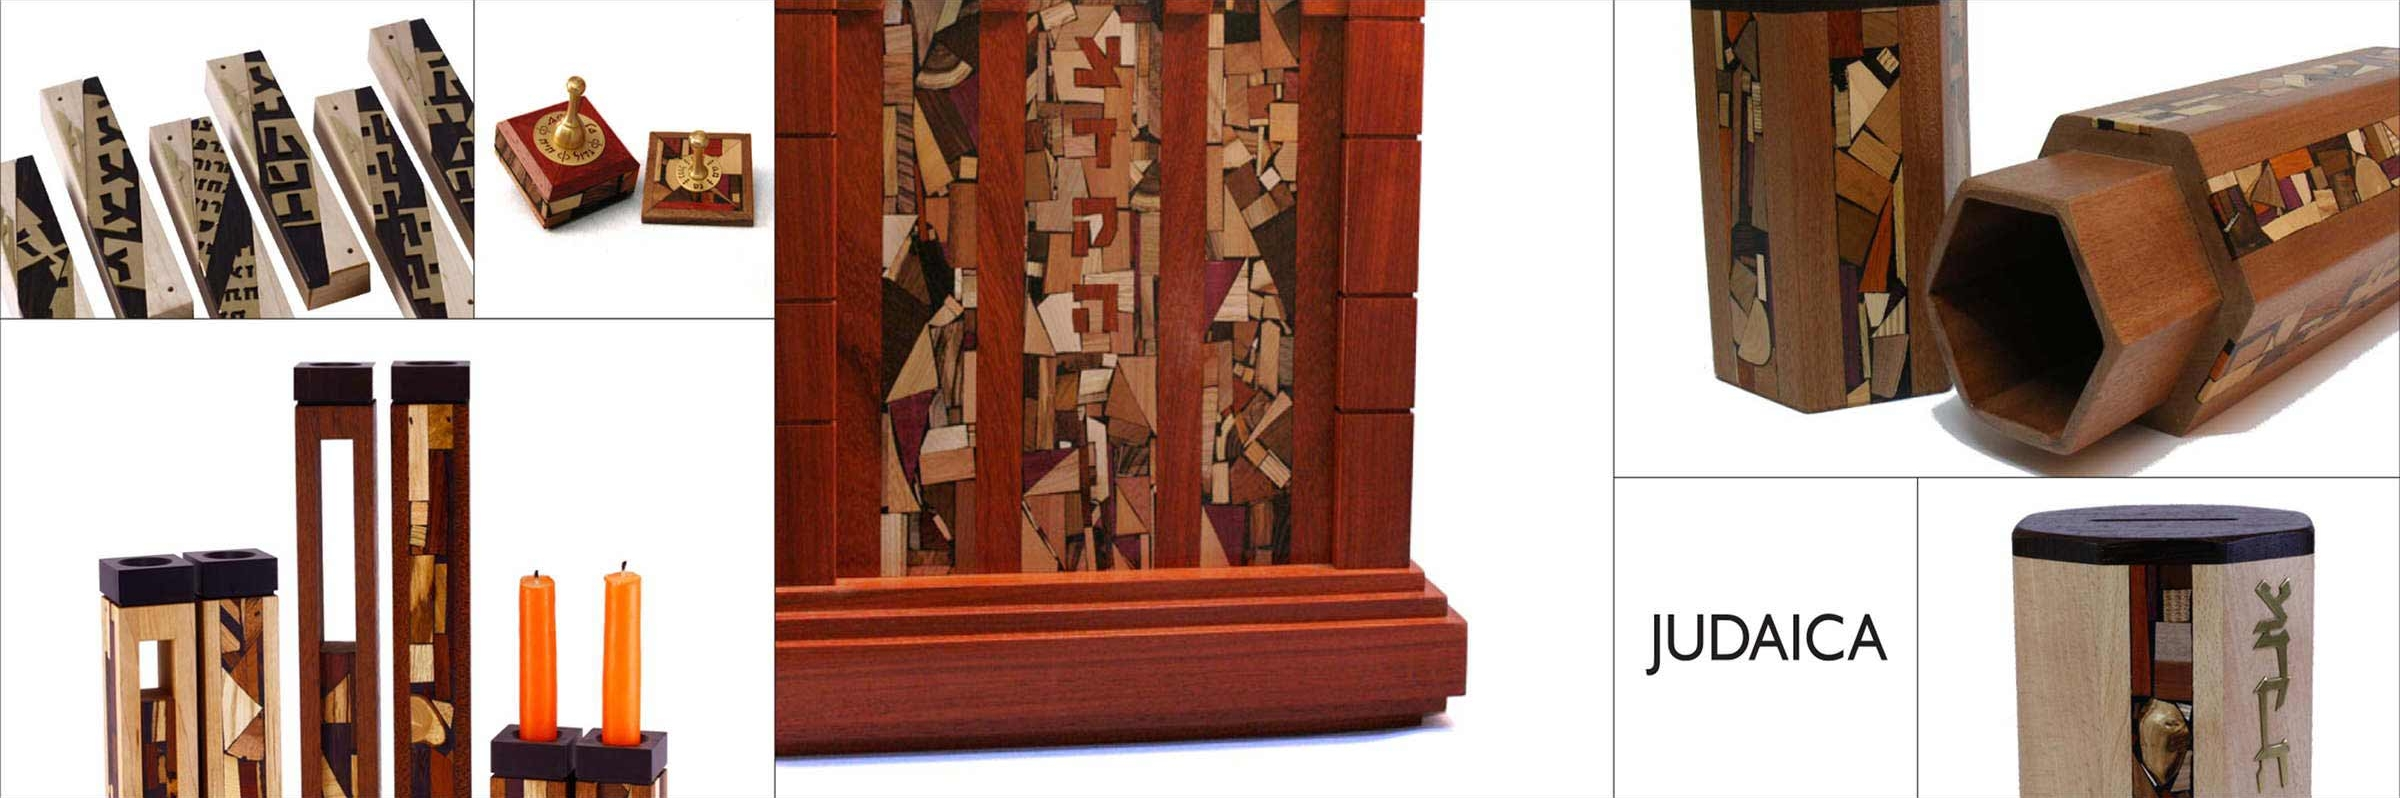 JudaicaBannerLarge-Etz-Ron-Handcrafted-Wooden-Judaica-Wood-Art-Home-Decor-Handmade-Jewelry-Website_banner-2-L_black-01-RW-2400-800_opt